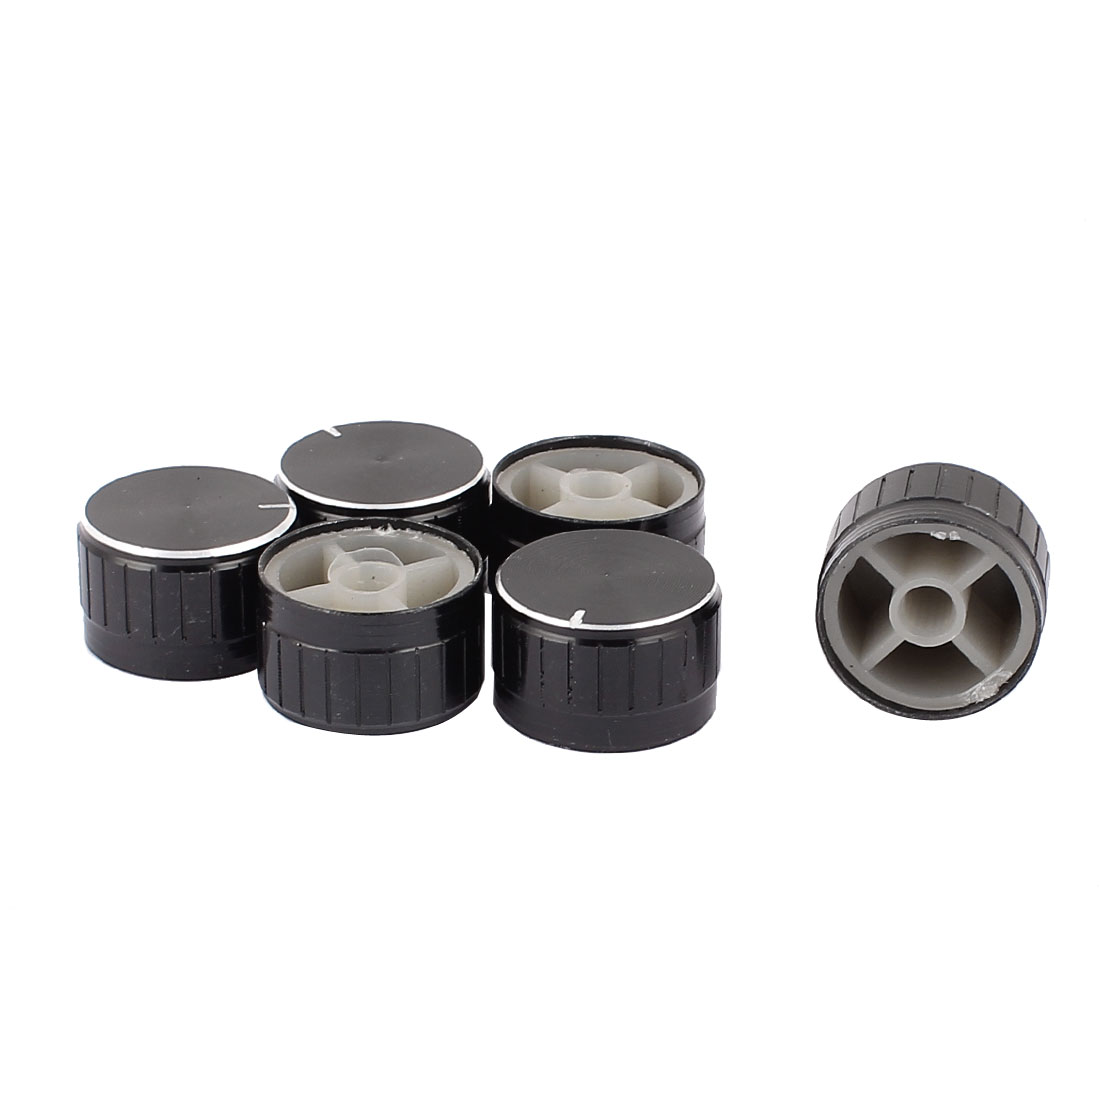 6 Pcs 26mm x 6mm Potentiometer Control Switch Volume Cap Aluminium Alloy Knurled Button Black